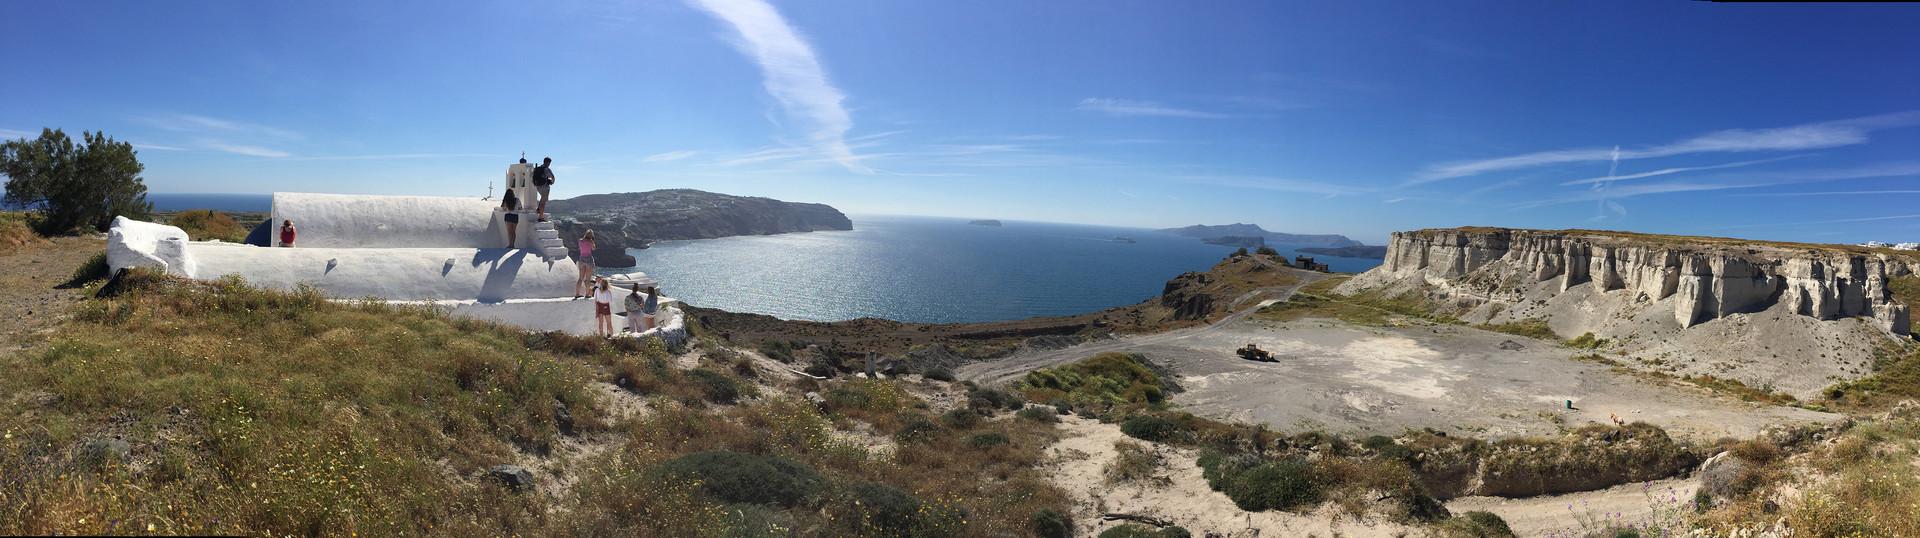 UTK Greece & Taxiarches Santorini.jpg